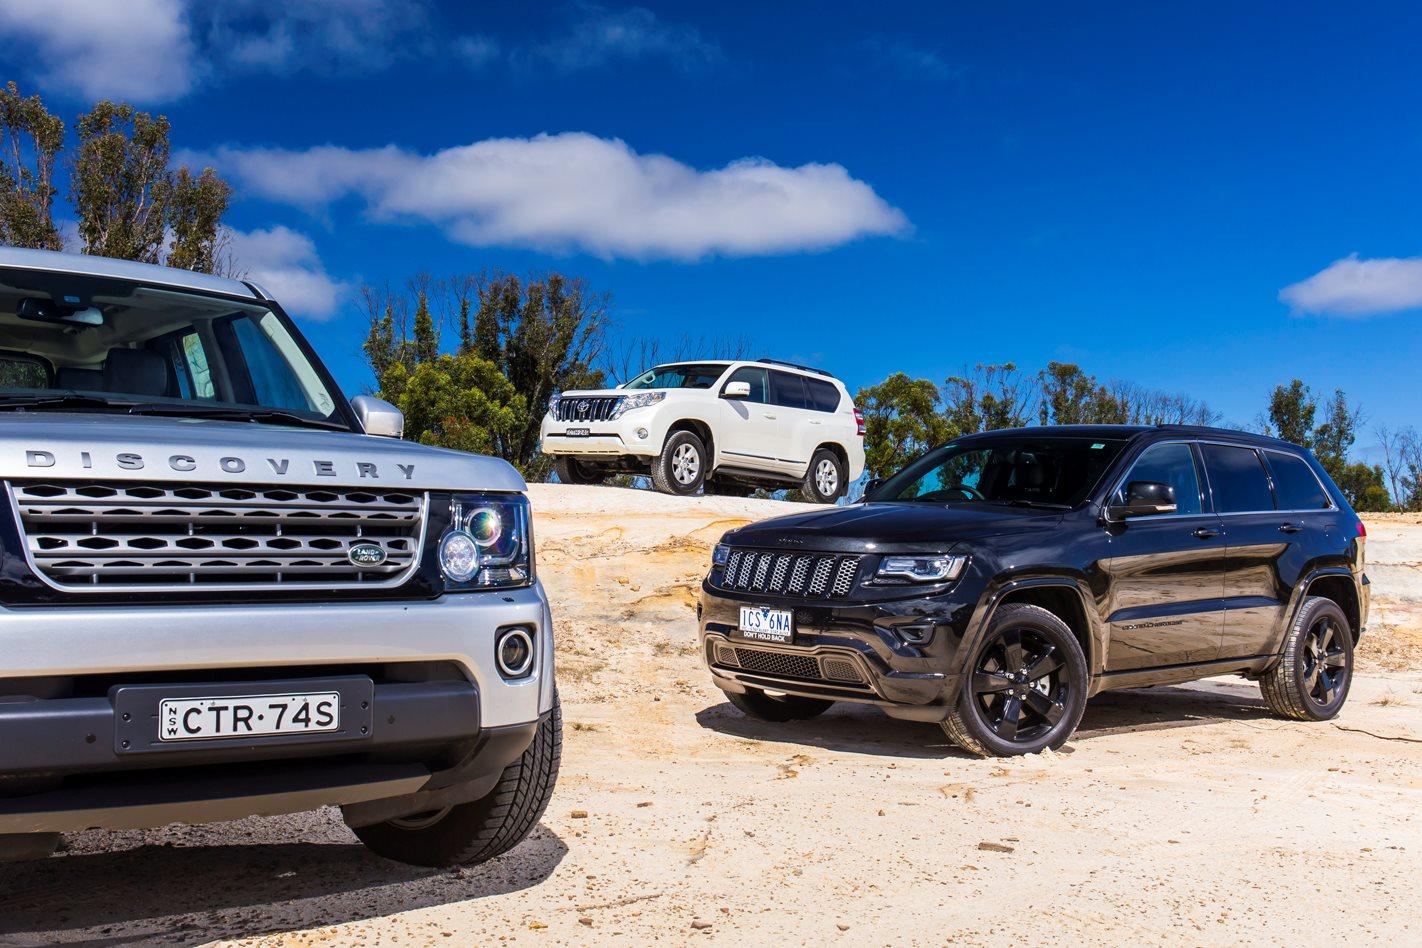 jeep grand cherokee vs land rover discovery vs toyota prado review 4x4 australia. Black Bedroom Furniture Sets. Home Design Ideas